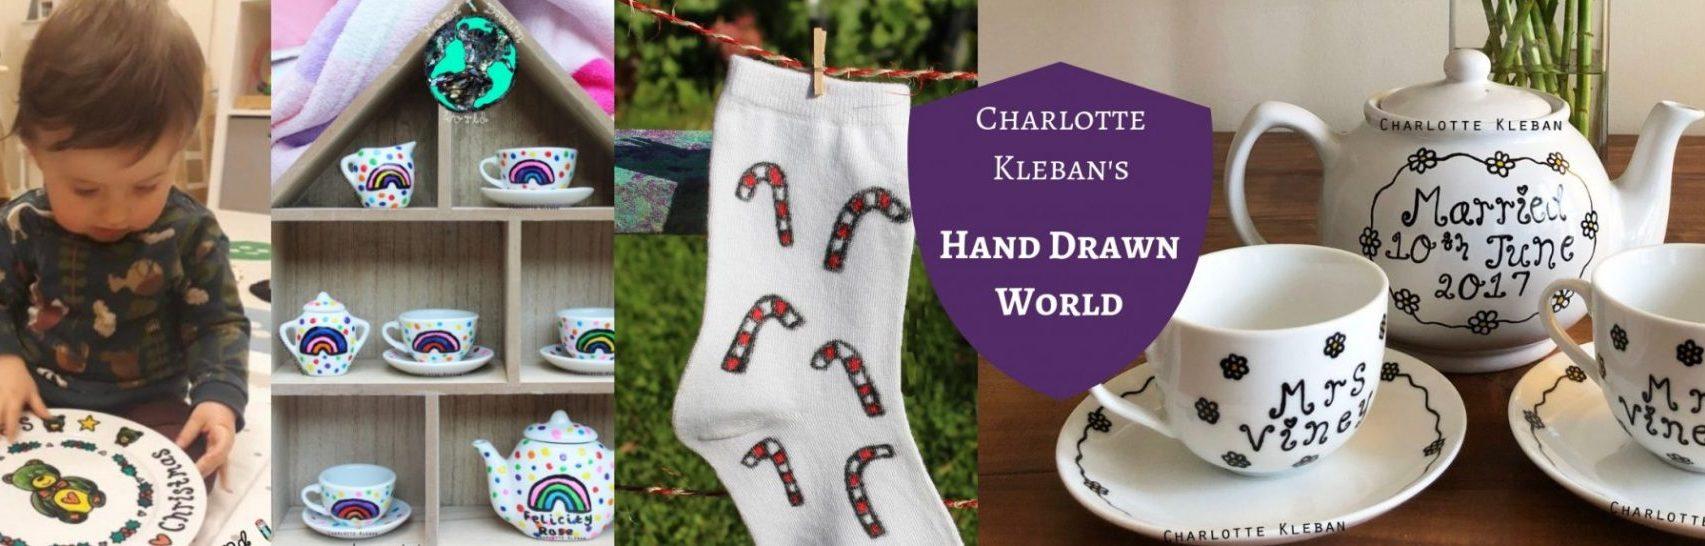 Hand Drawn World By Charlotte Kleban teapots, dinner plates, tea towels, teapot sets, unisex socks, espresso cups